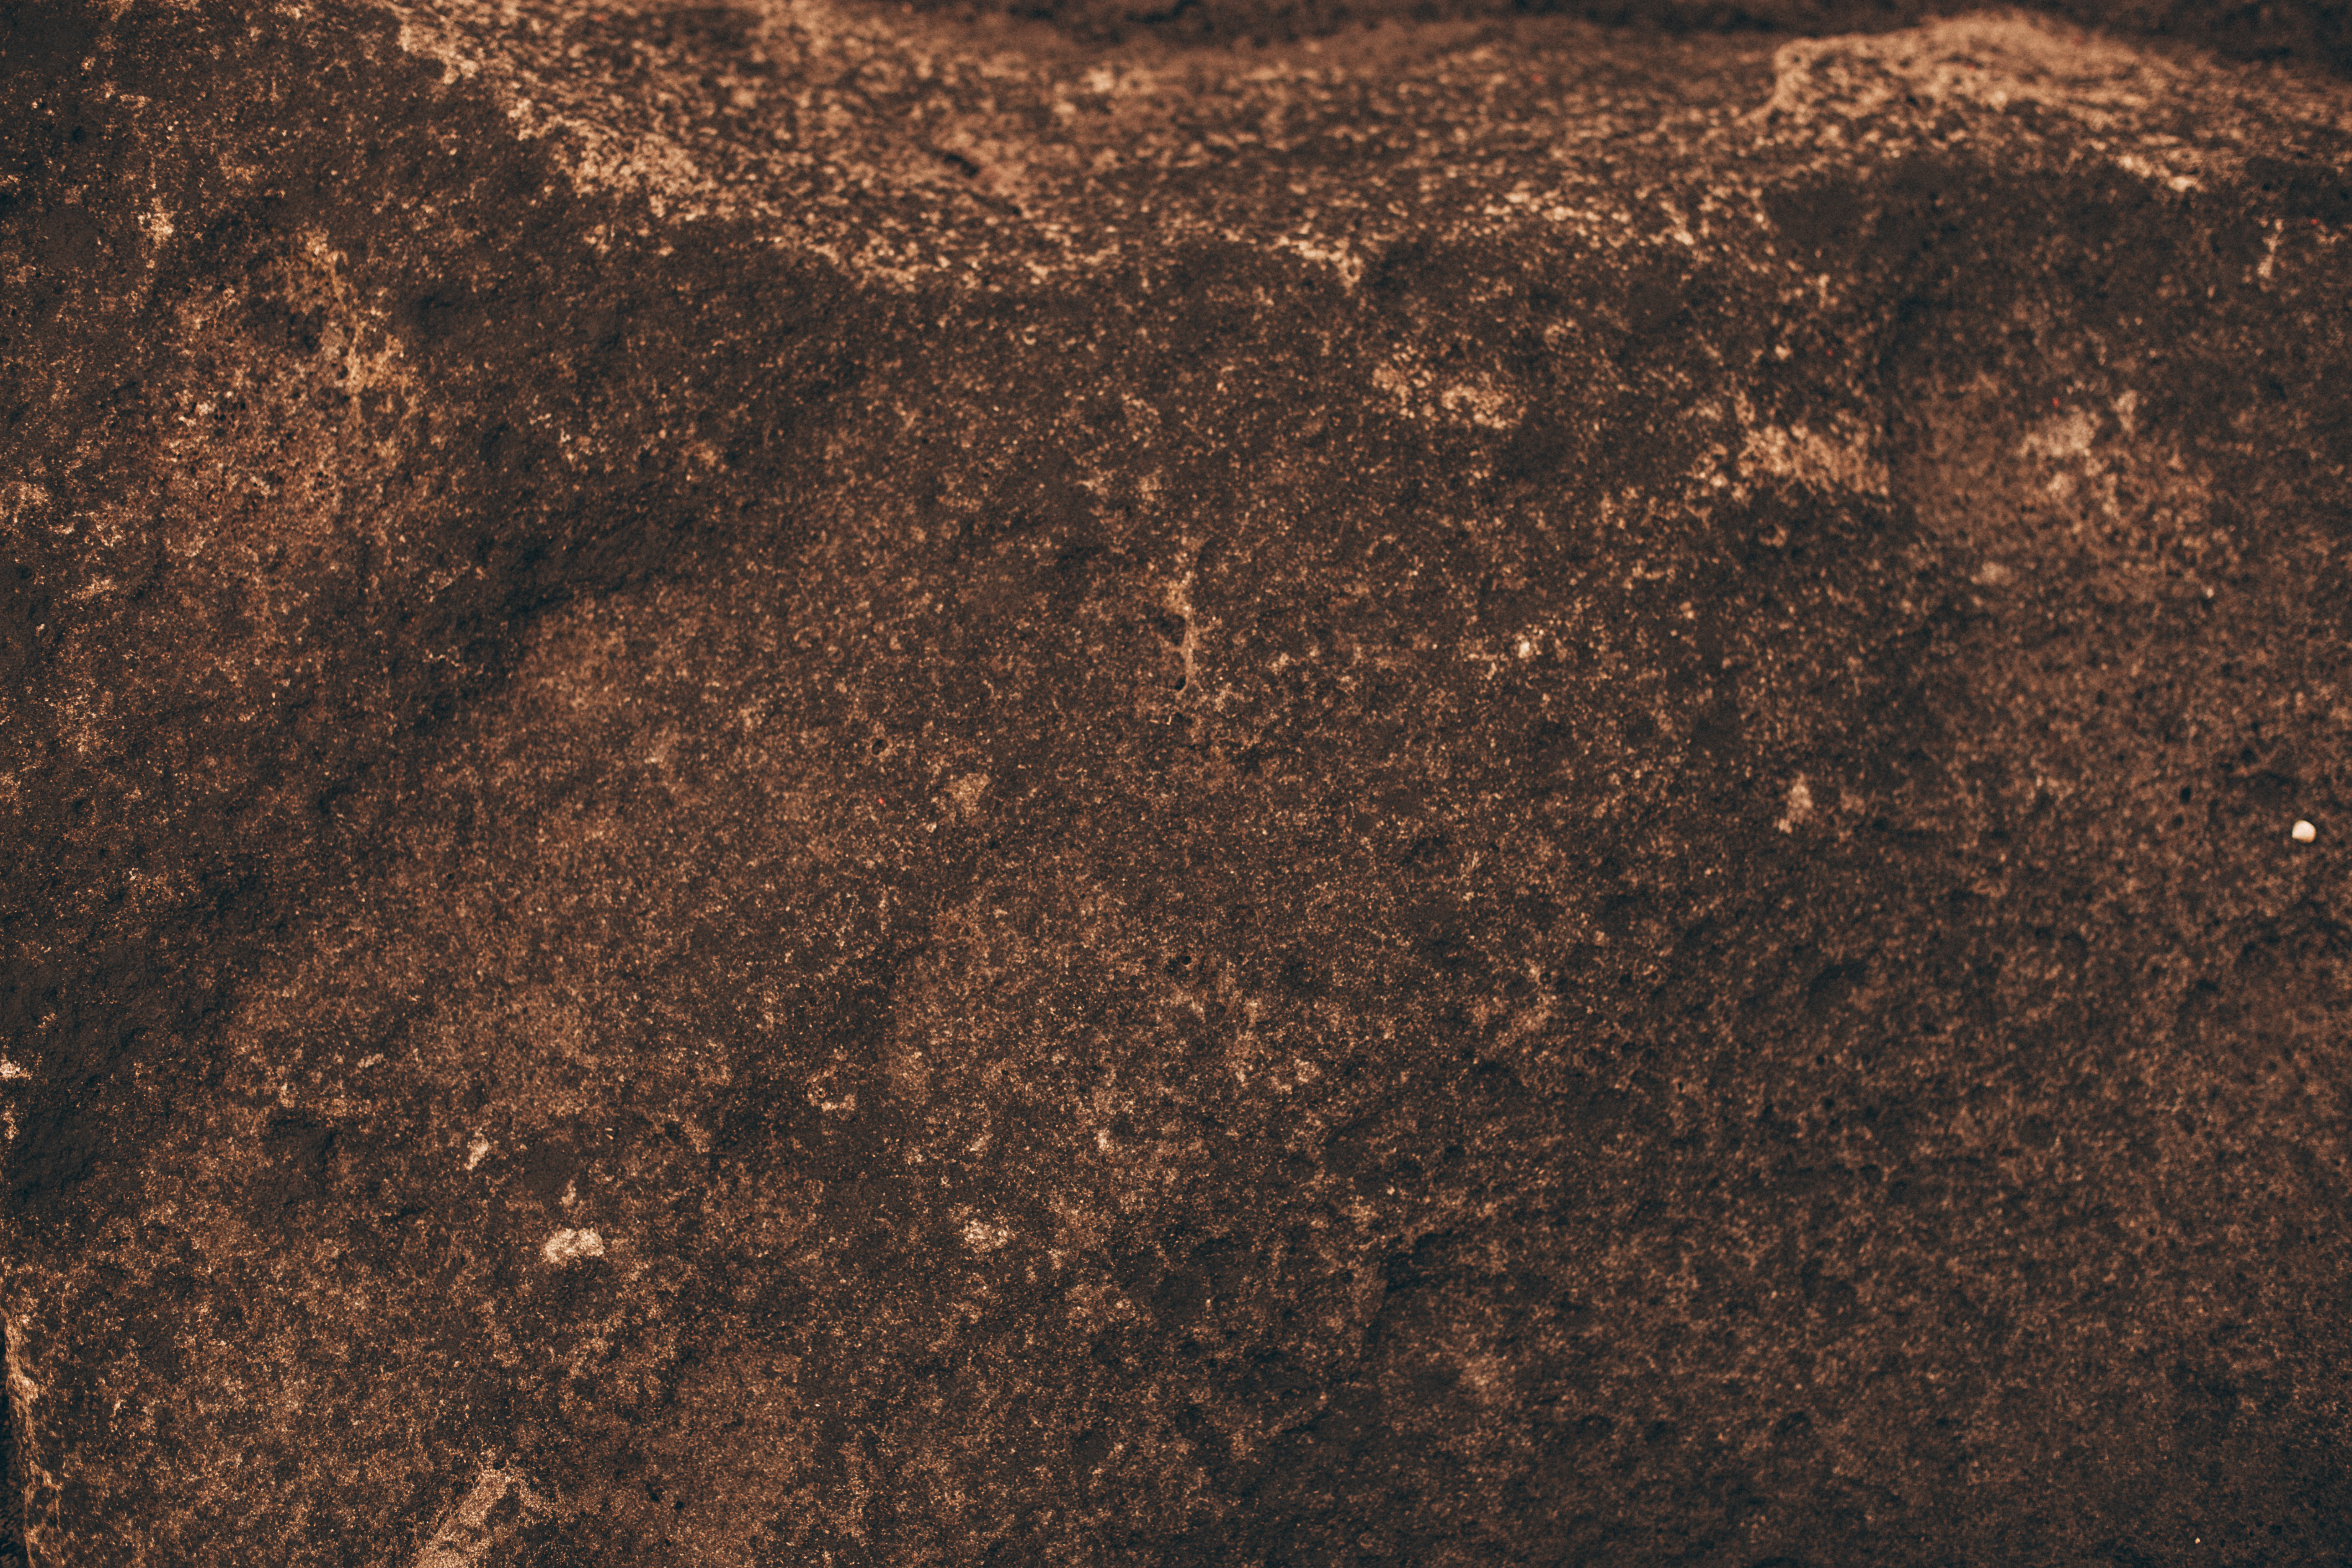 Volcanic Rock Texture, Cliff, Grunge, Grungy, Icelandic, HQ Photo